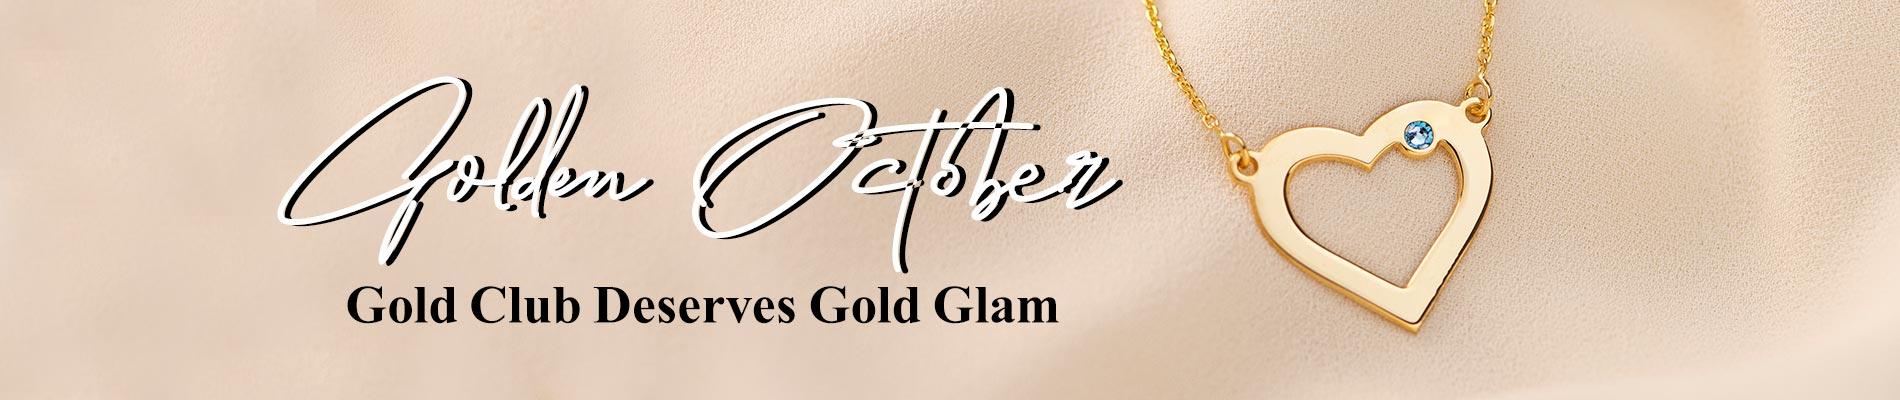 Golden October desktop banner